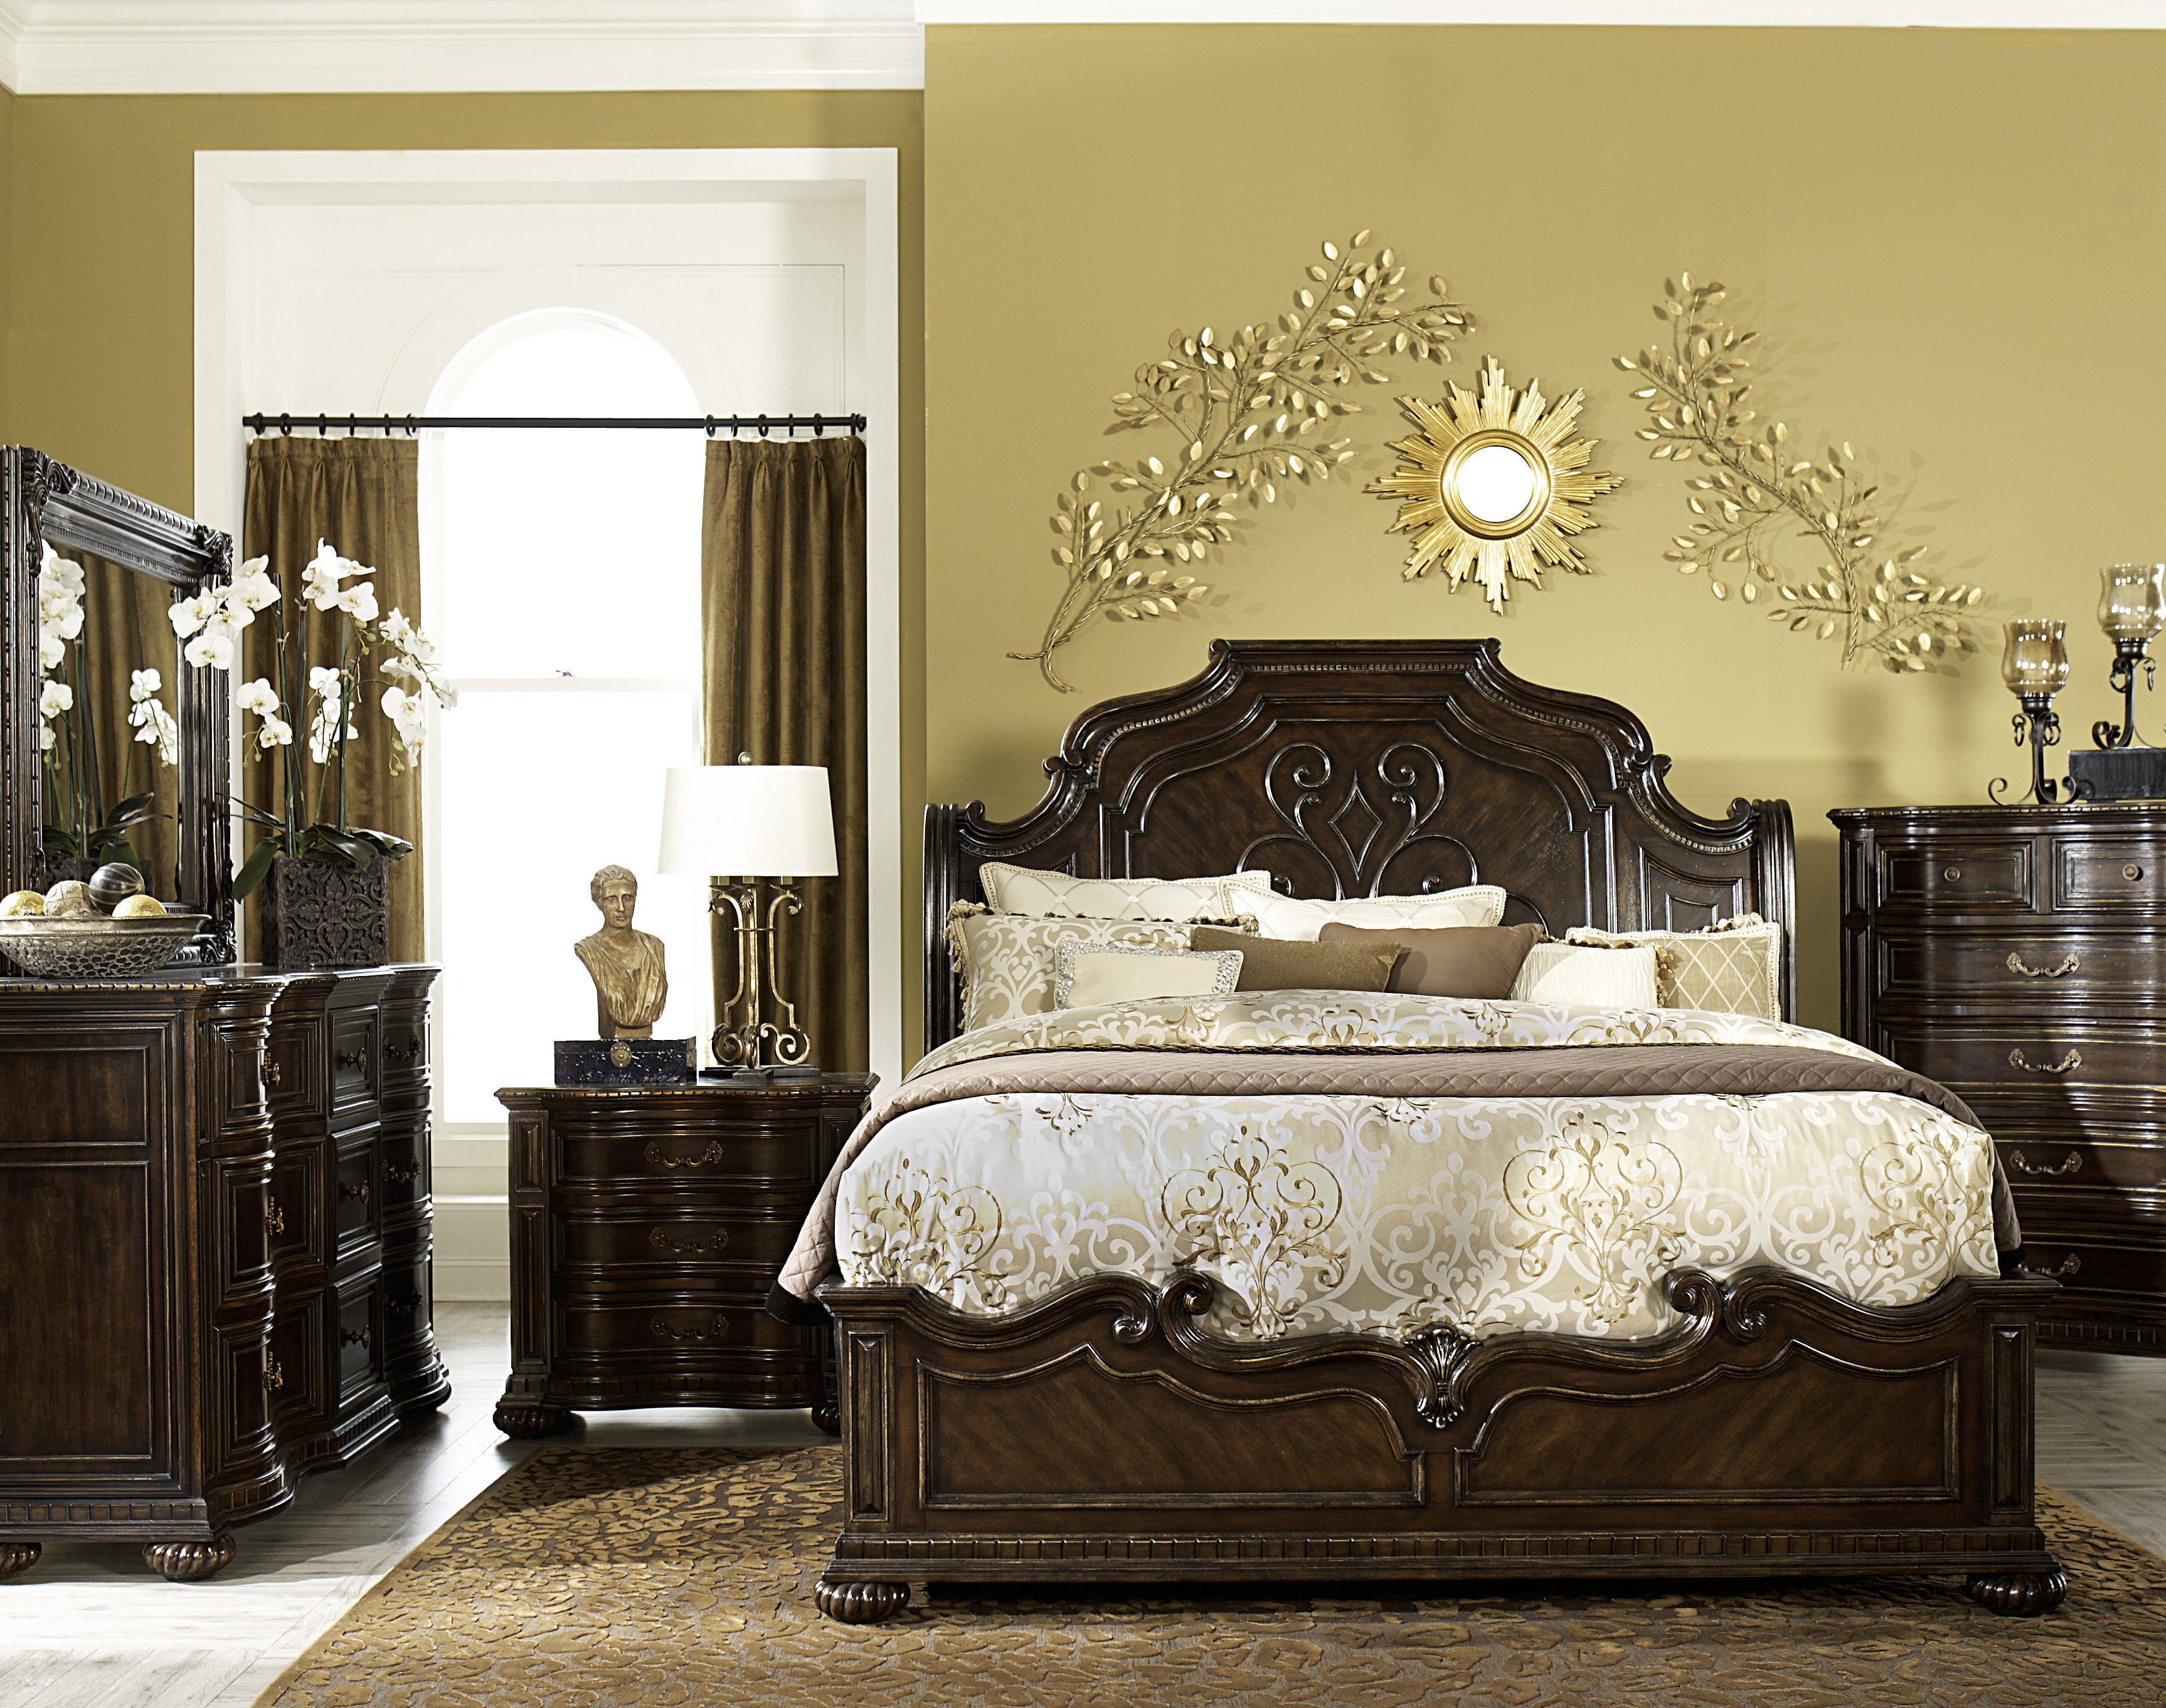 Legacy Classic La Bella Vita California King Bedroom Group - Item Number: 4200 CK Bedroom Group 3